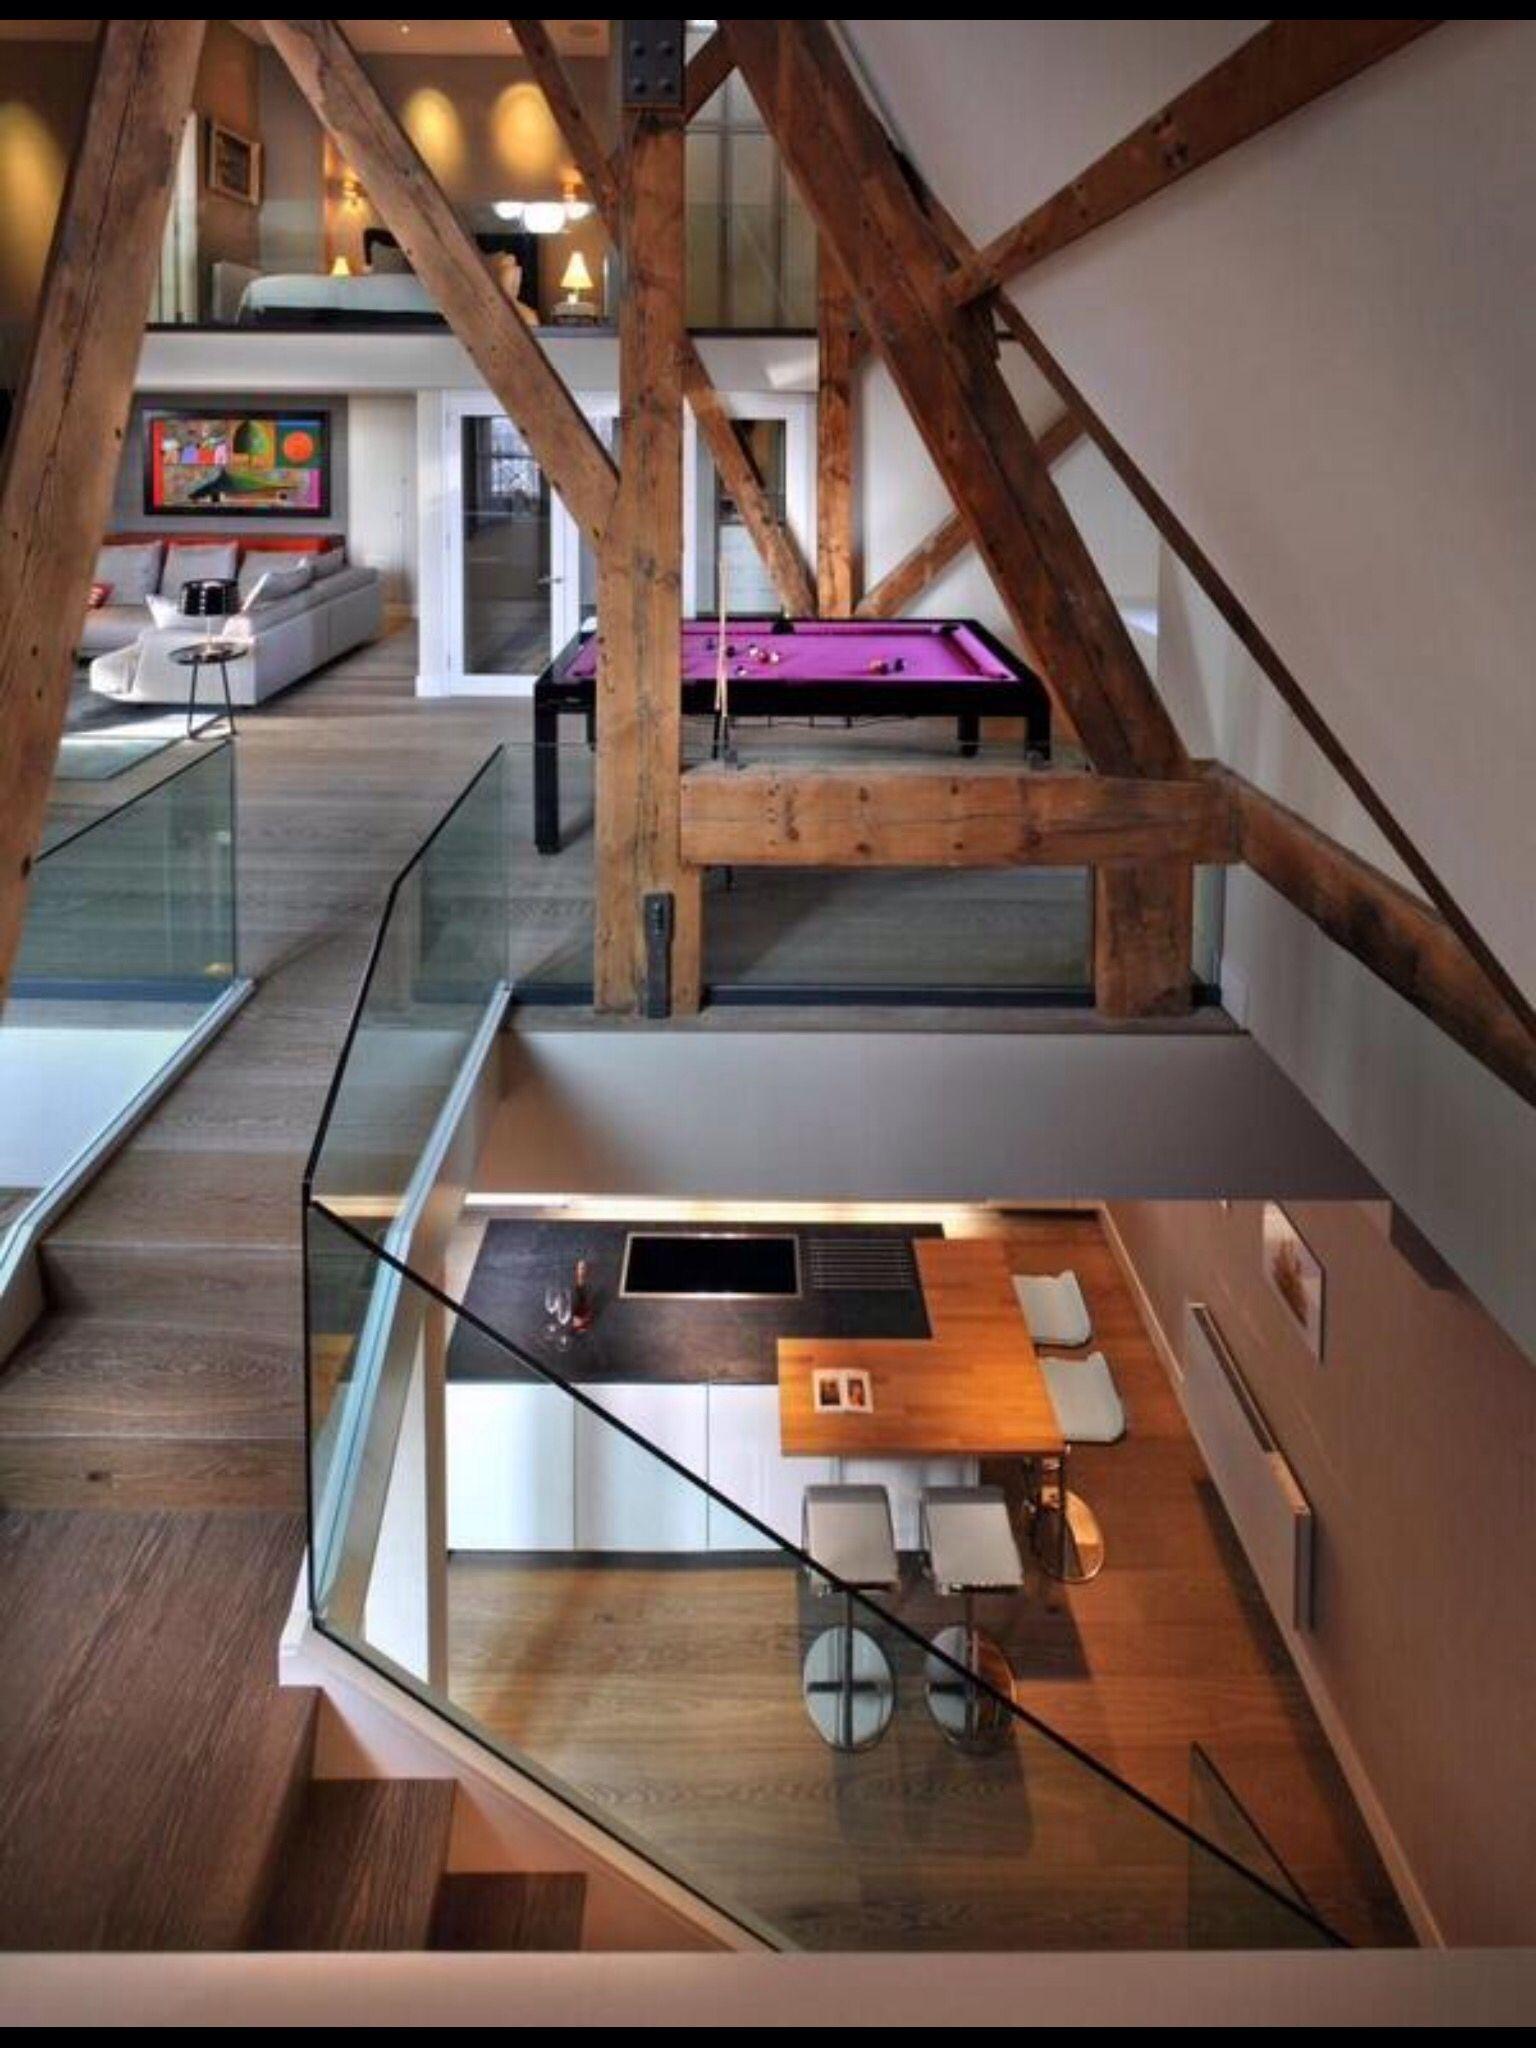 Habitacion Subsuelo Arquitectura Interior Casas Elegantes Disenos De Casas